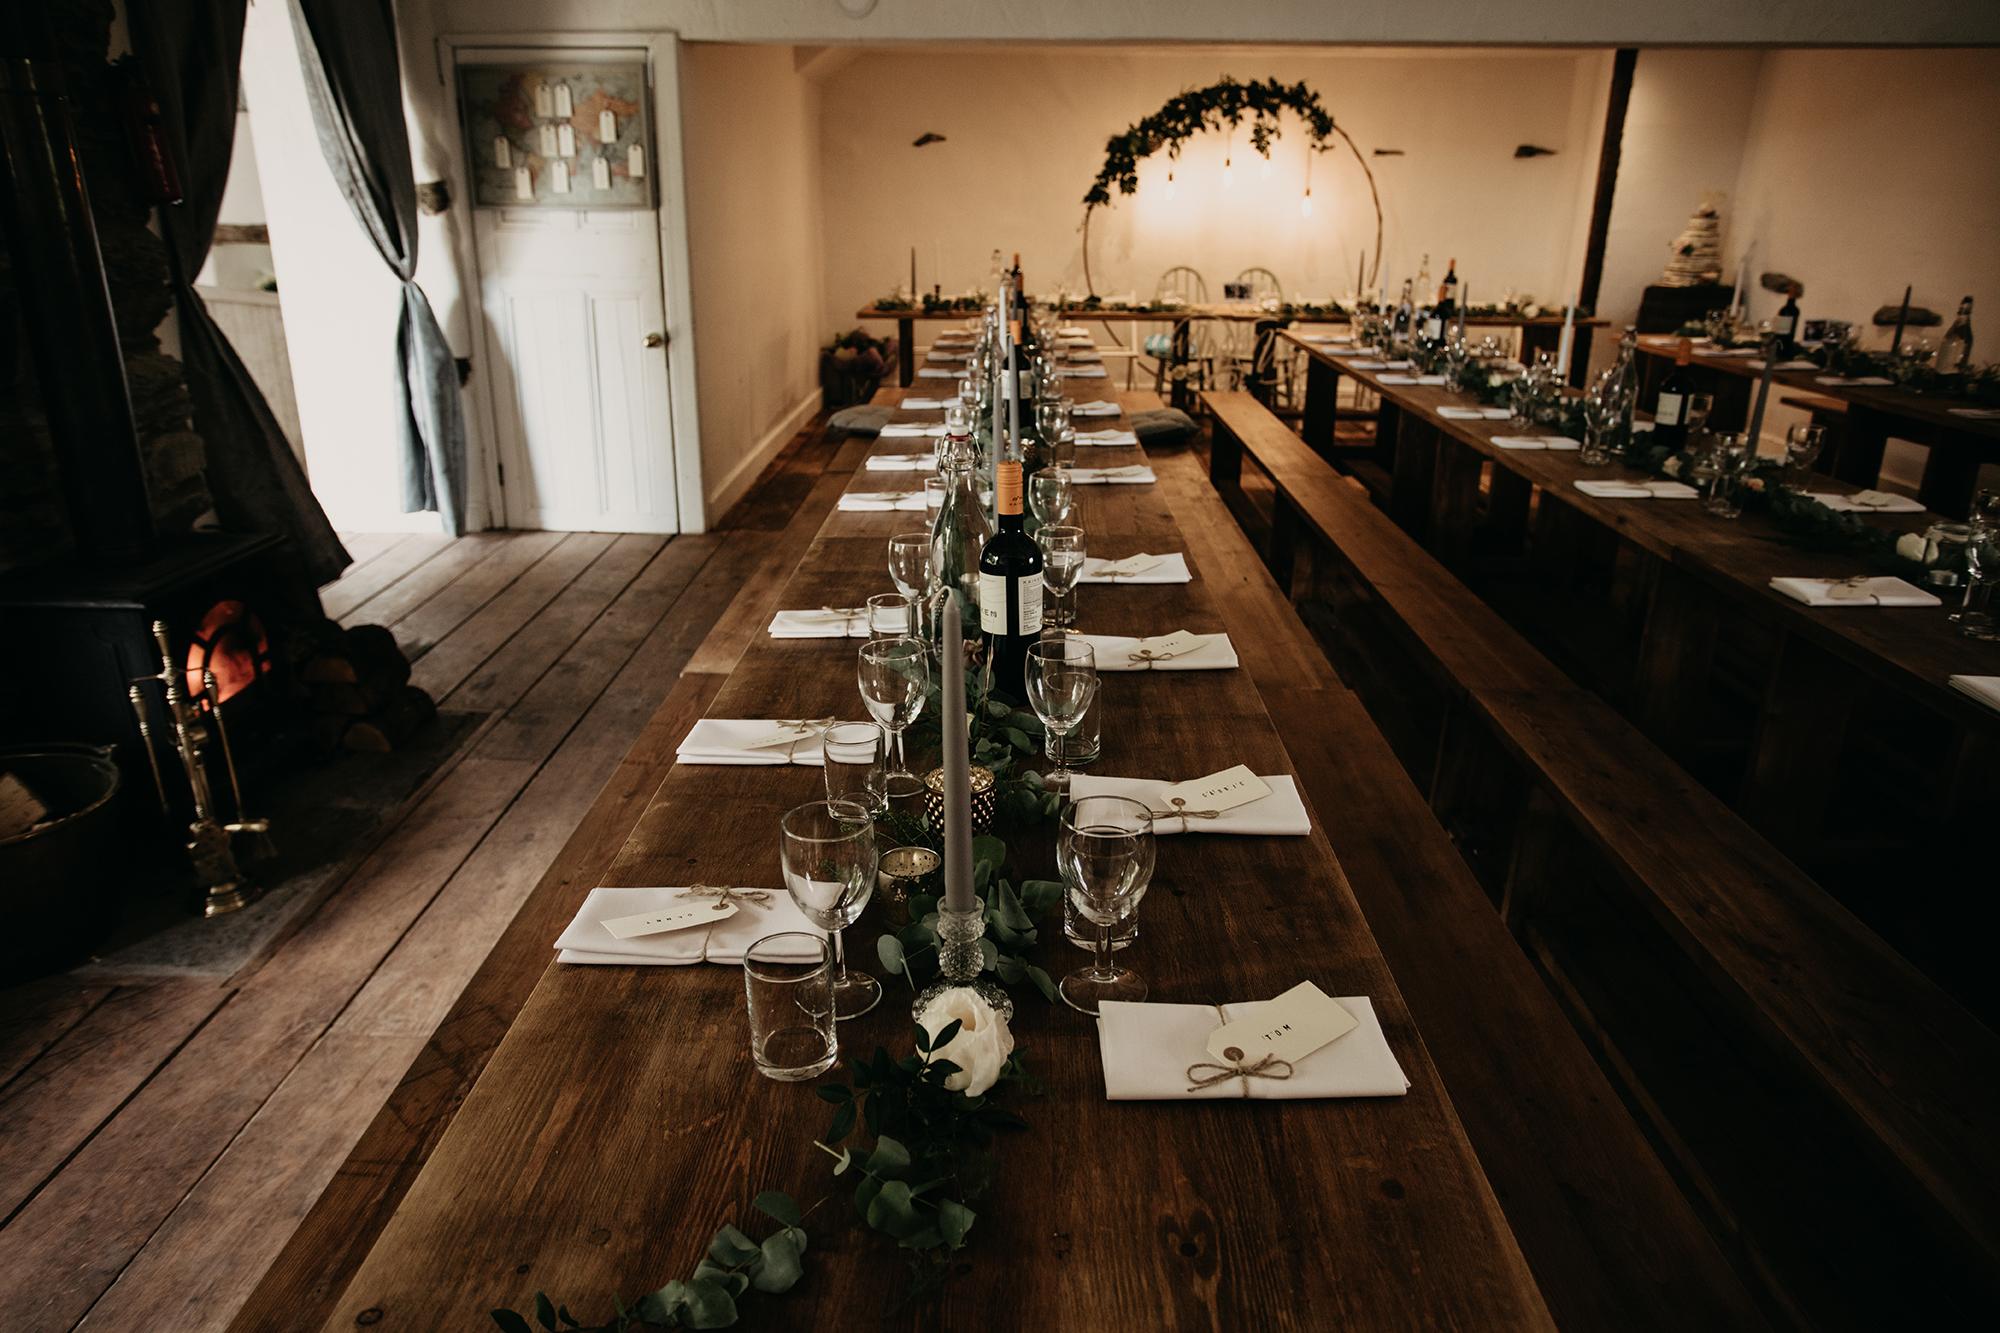 paddock barn kendal wedding